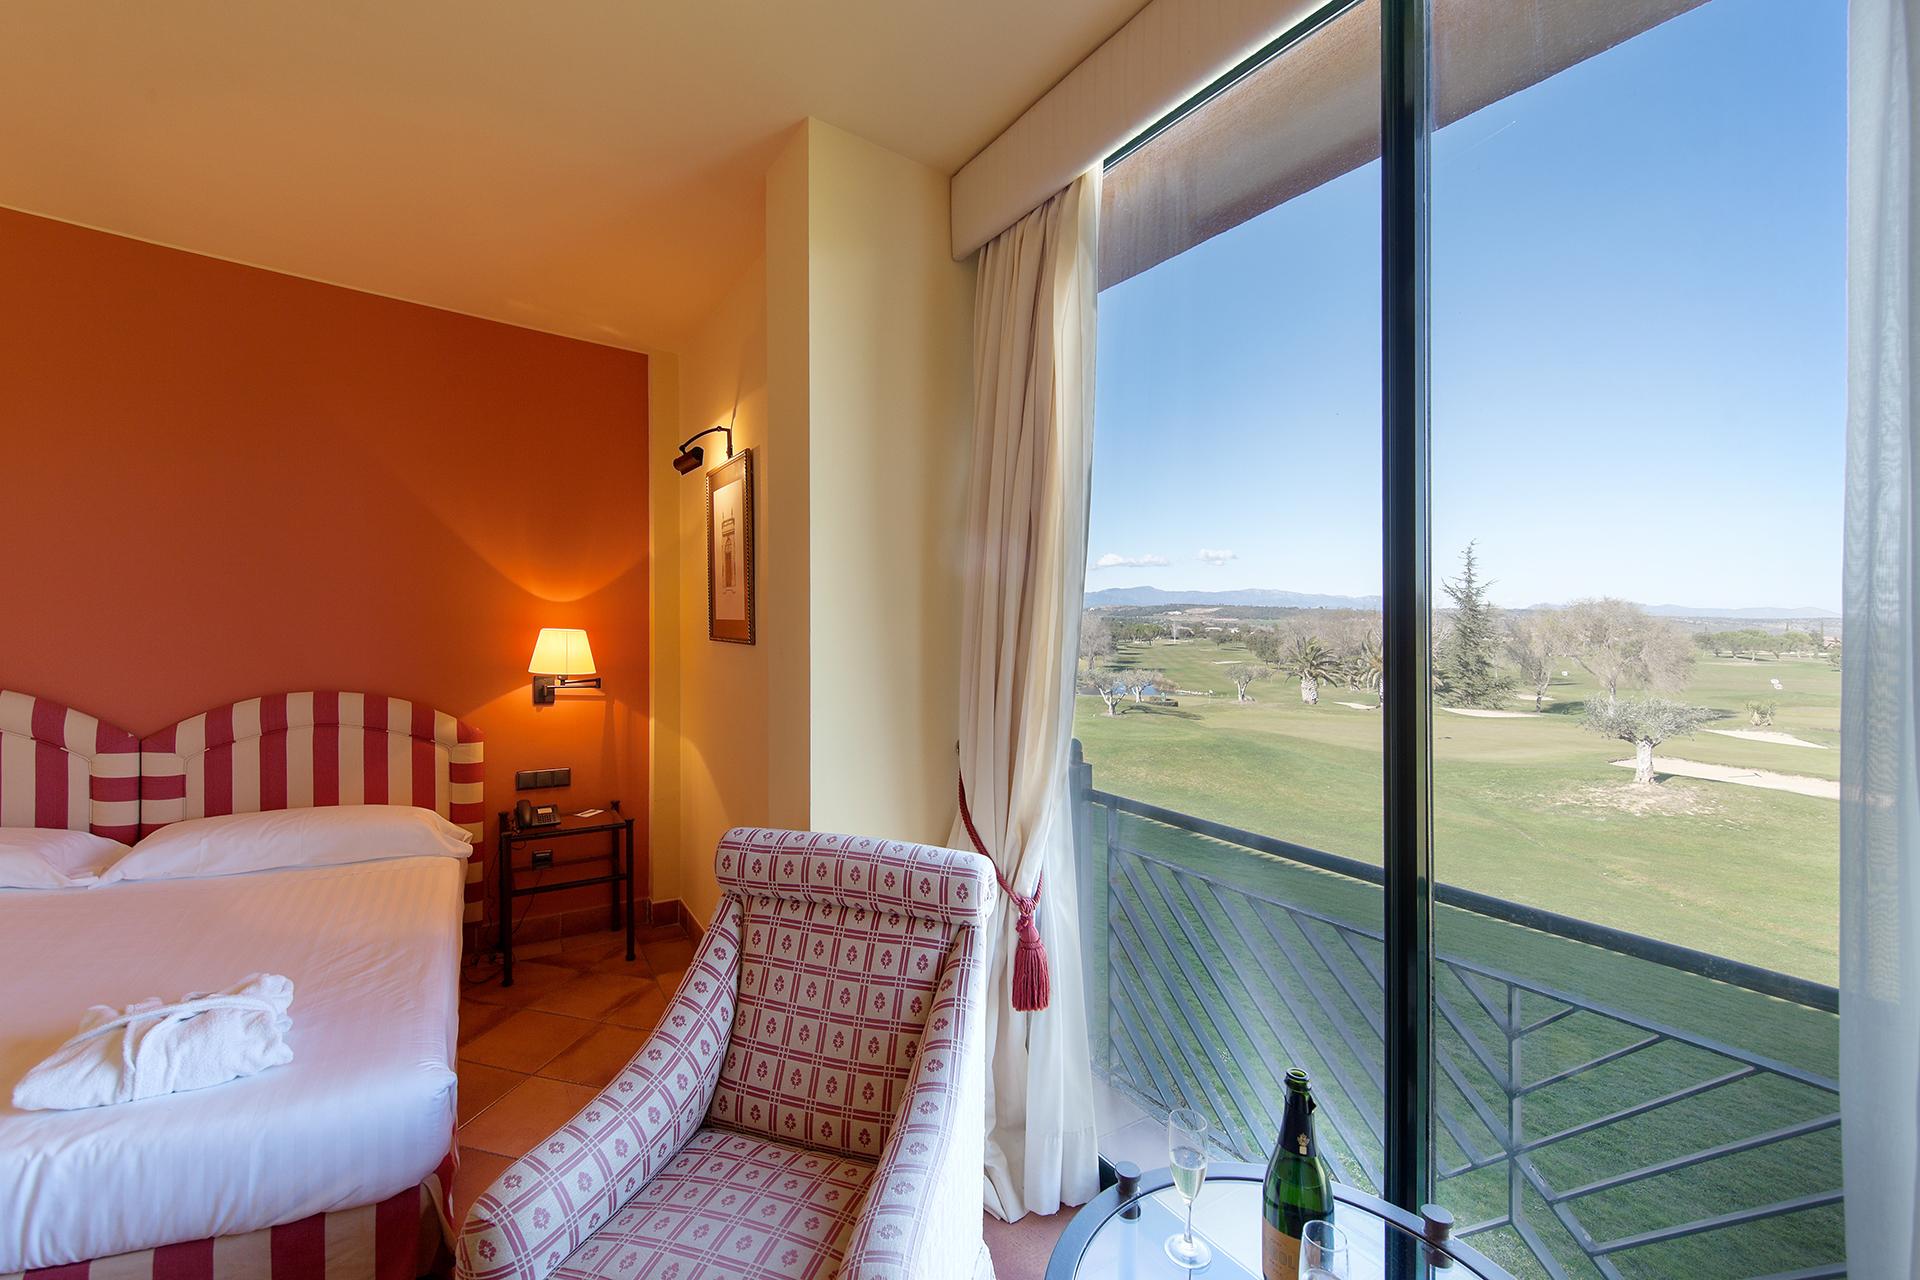 Golf-Expedition-Golf-reizen-Spanje-Regio-Barcelona-TorreMirona-Golf-&-Spa-Resort-bedroom-view